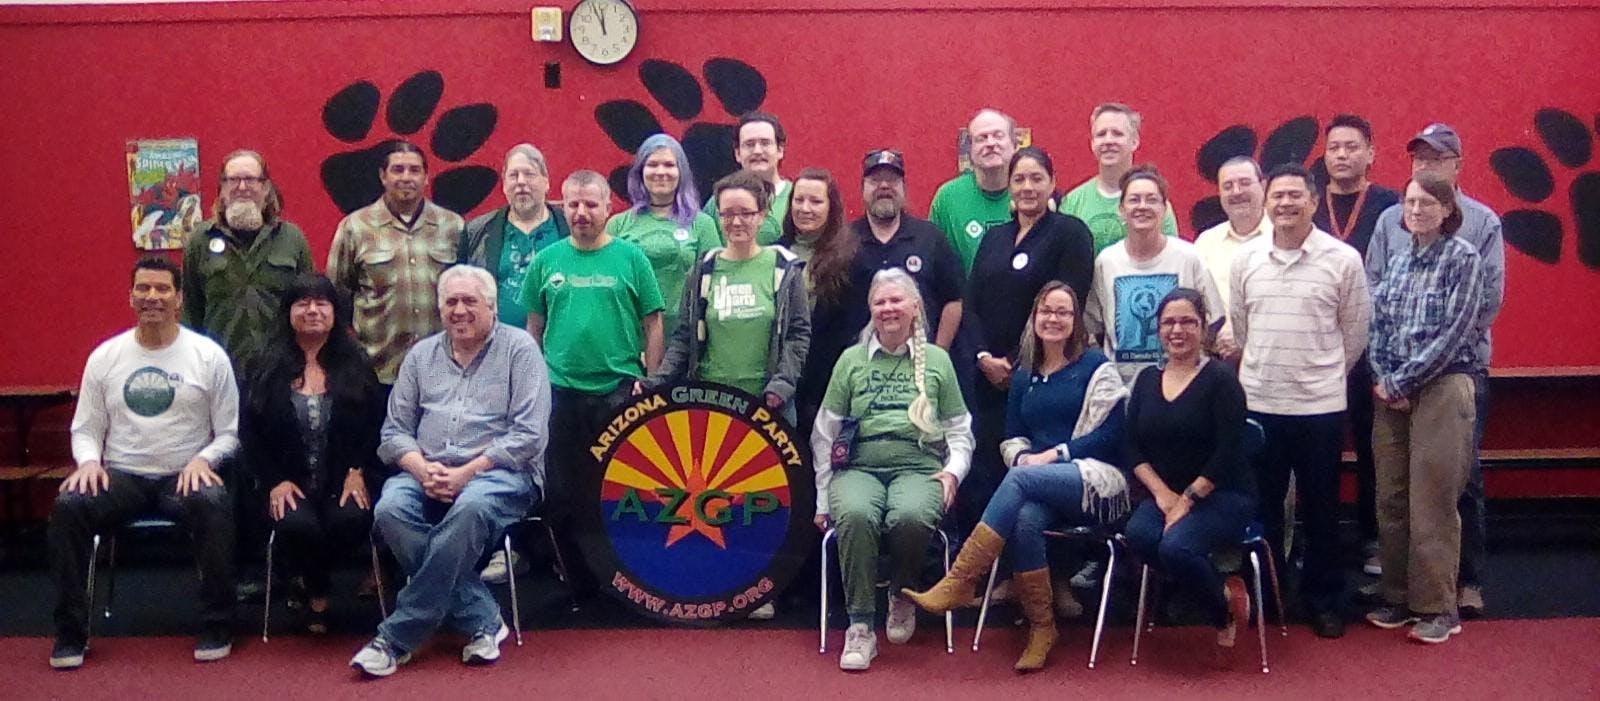 Arizona Green Party (AZGP) General Membership meeting